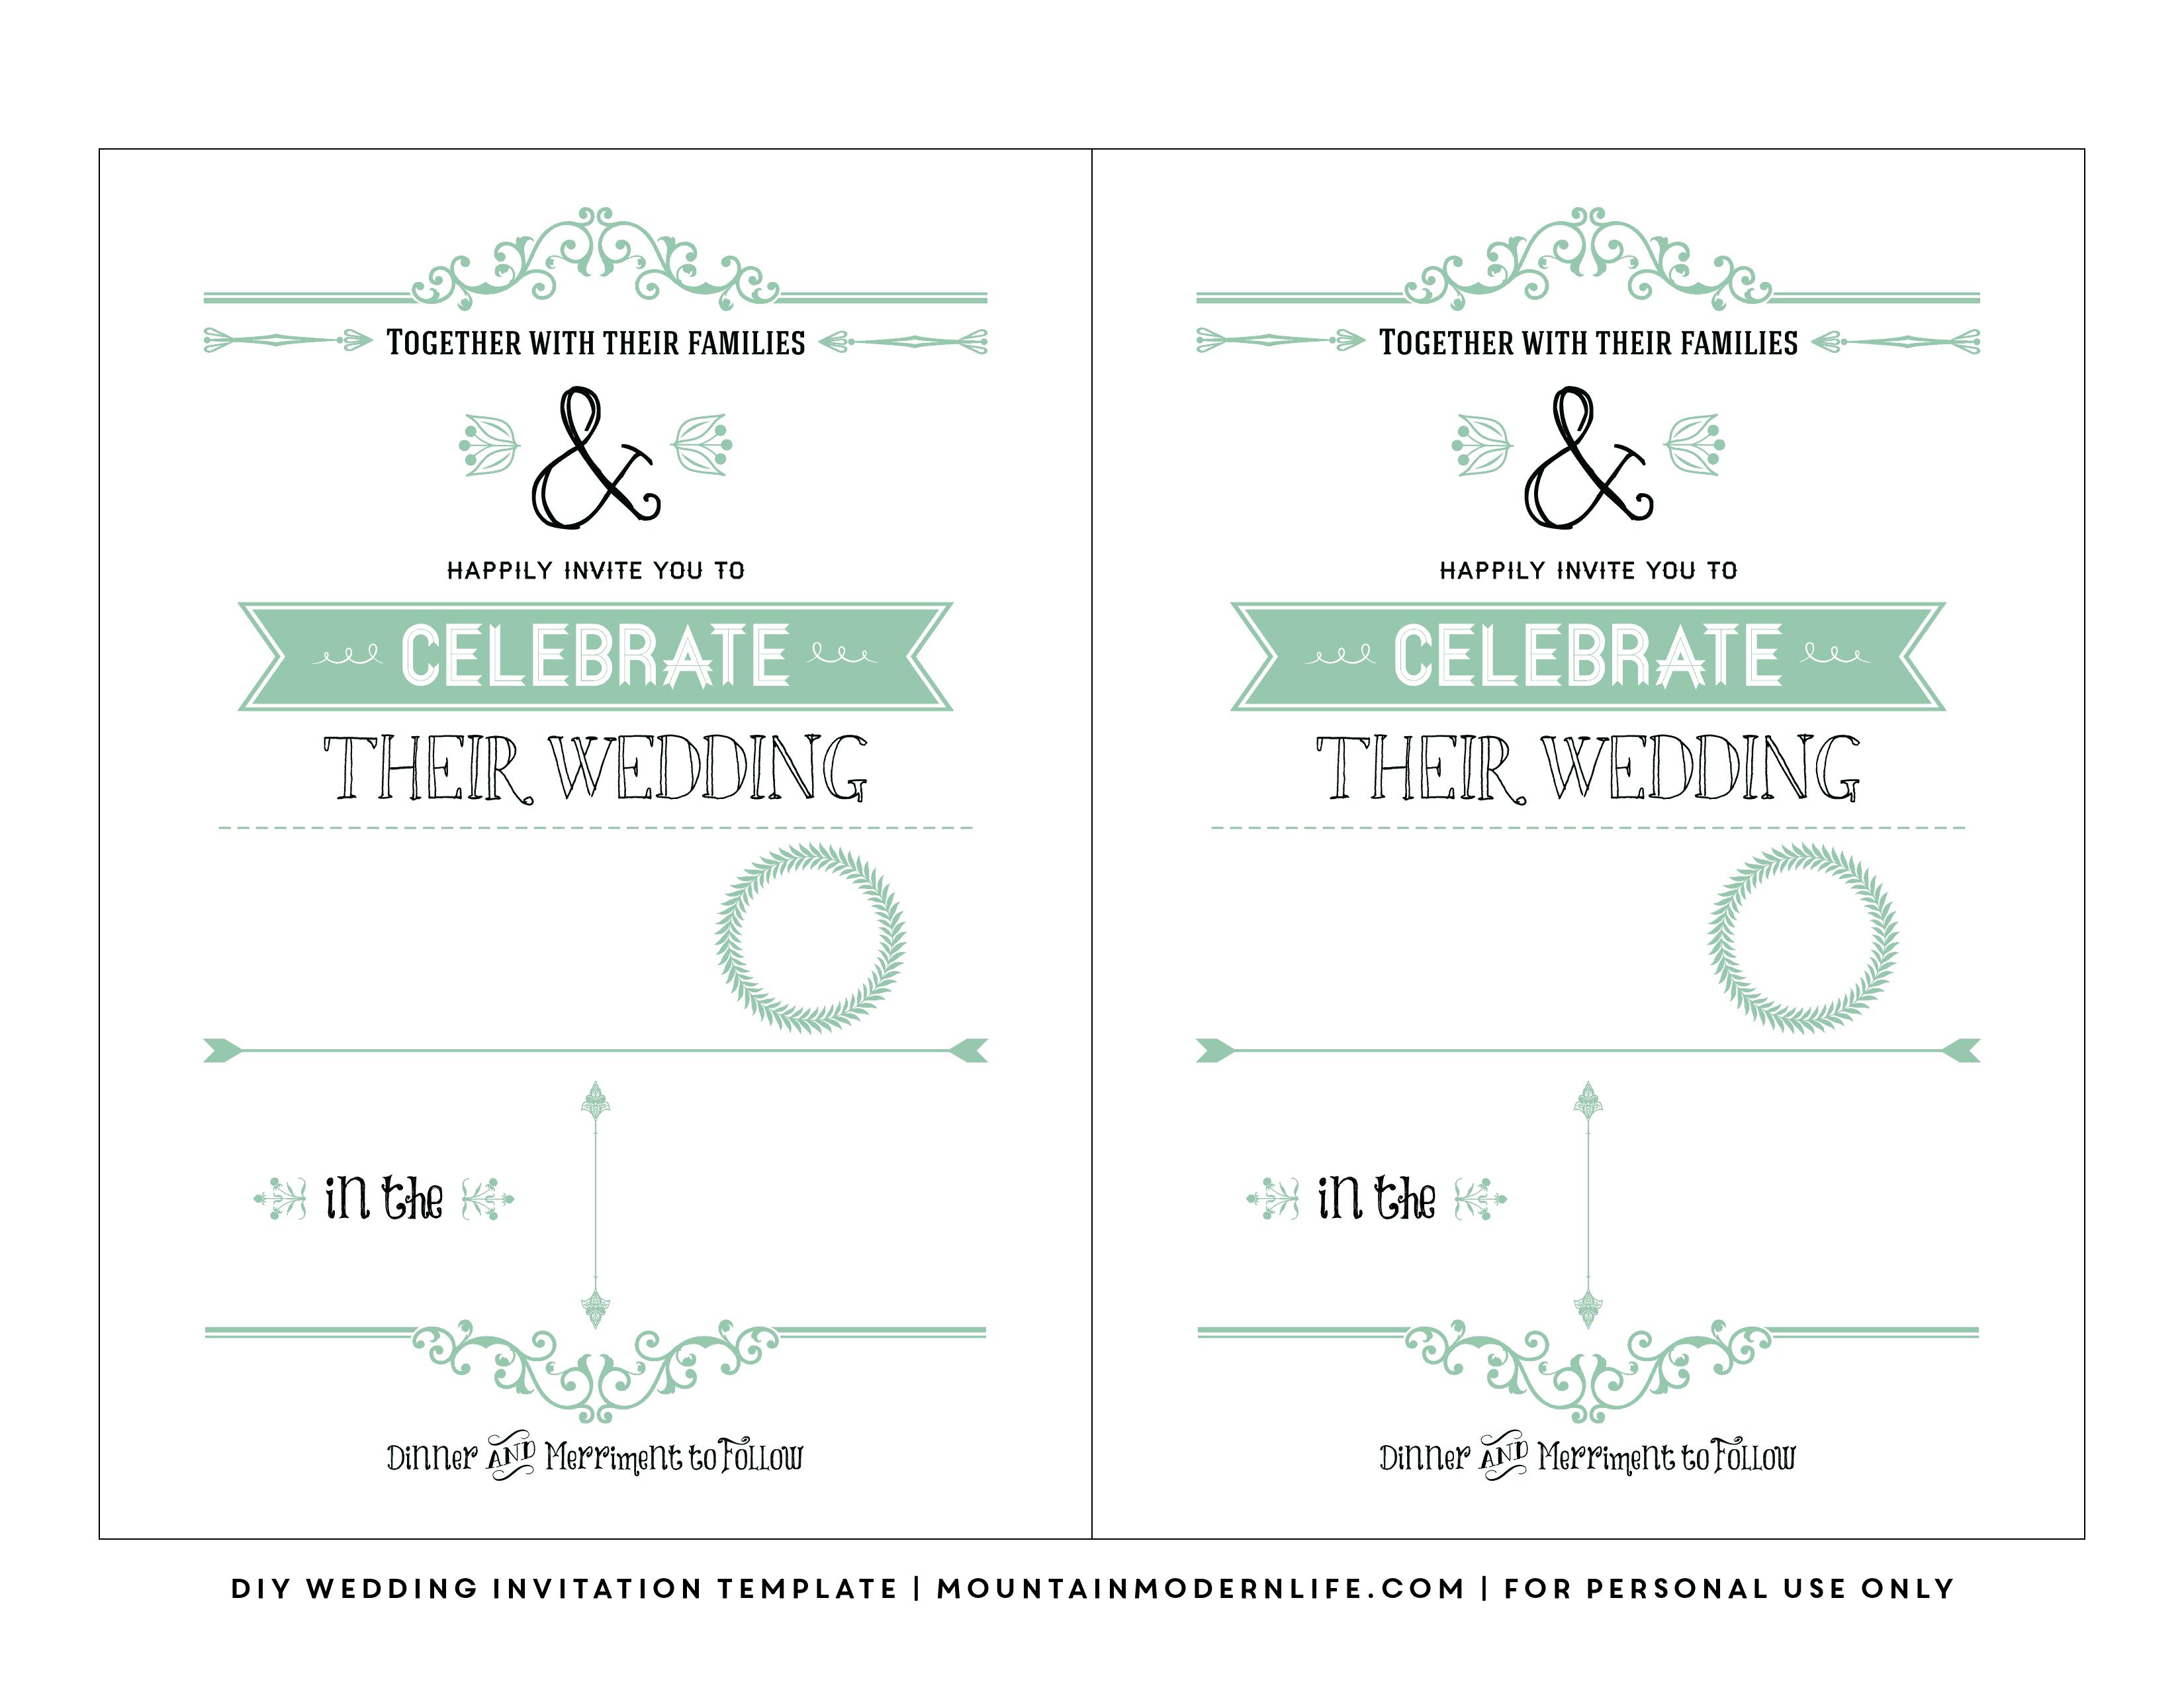 Free Wedding Invitation Template   Mountainmodernlife - Free Printable Wedding Invitations With Photo